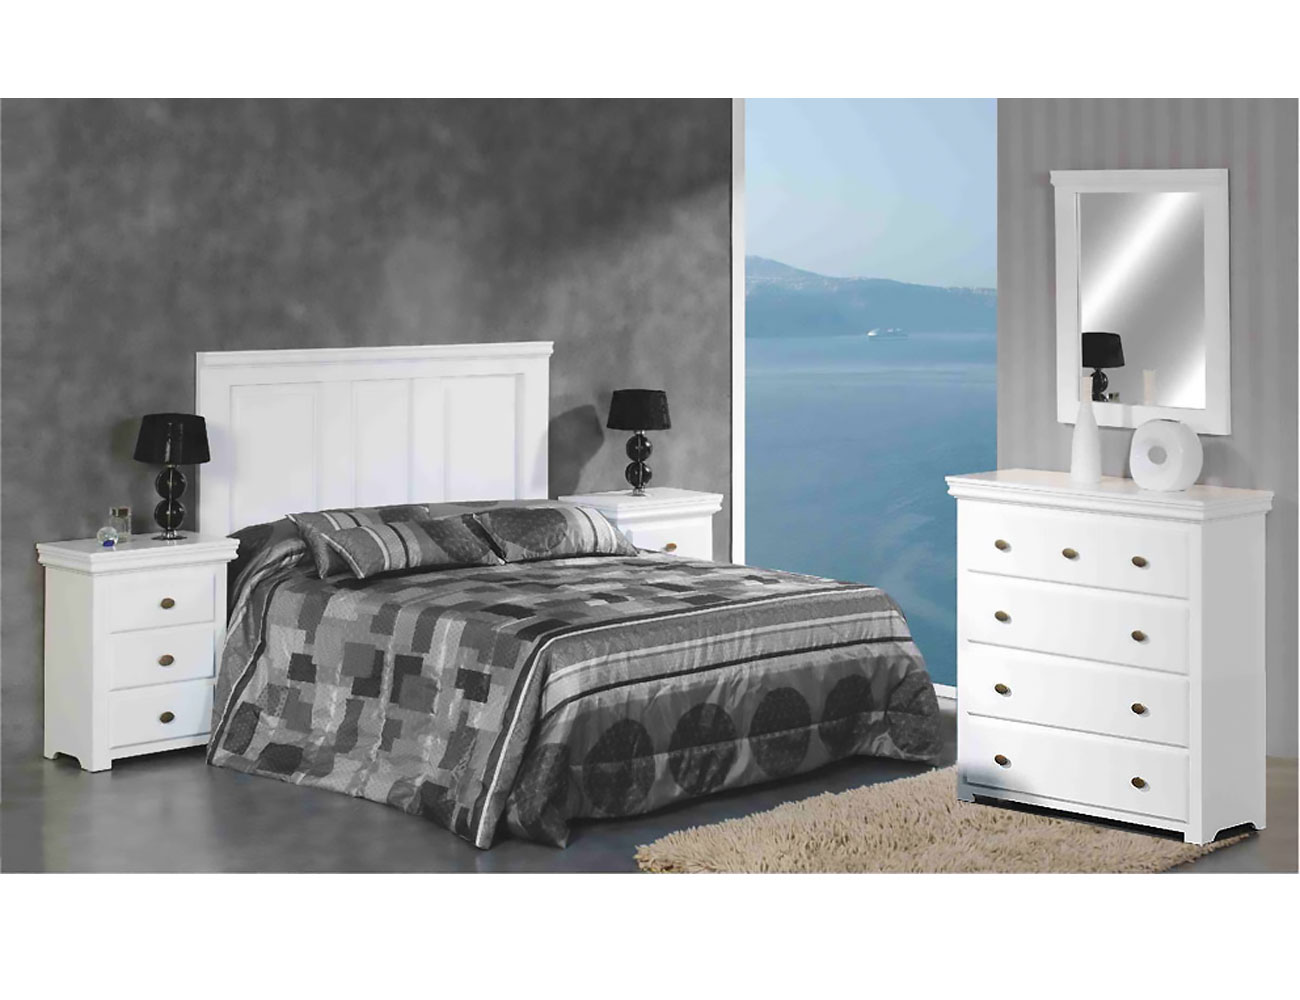 Dormitorio matrimonio comoda 5 c madera dm lacado blanco5